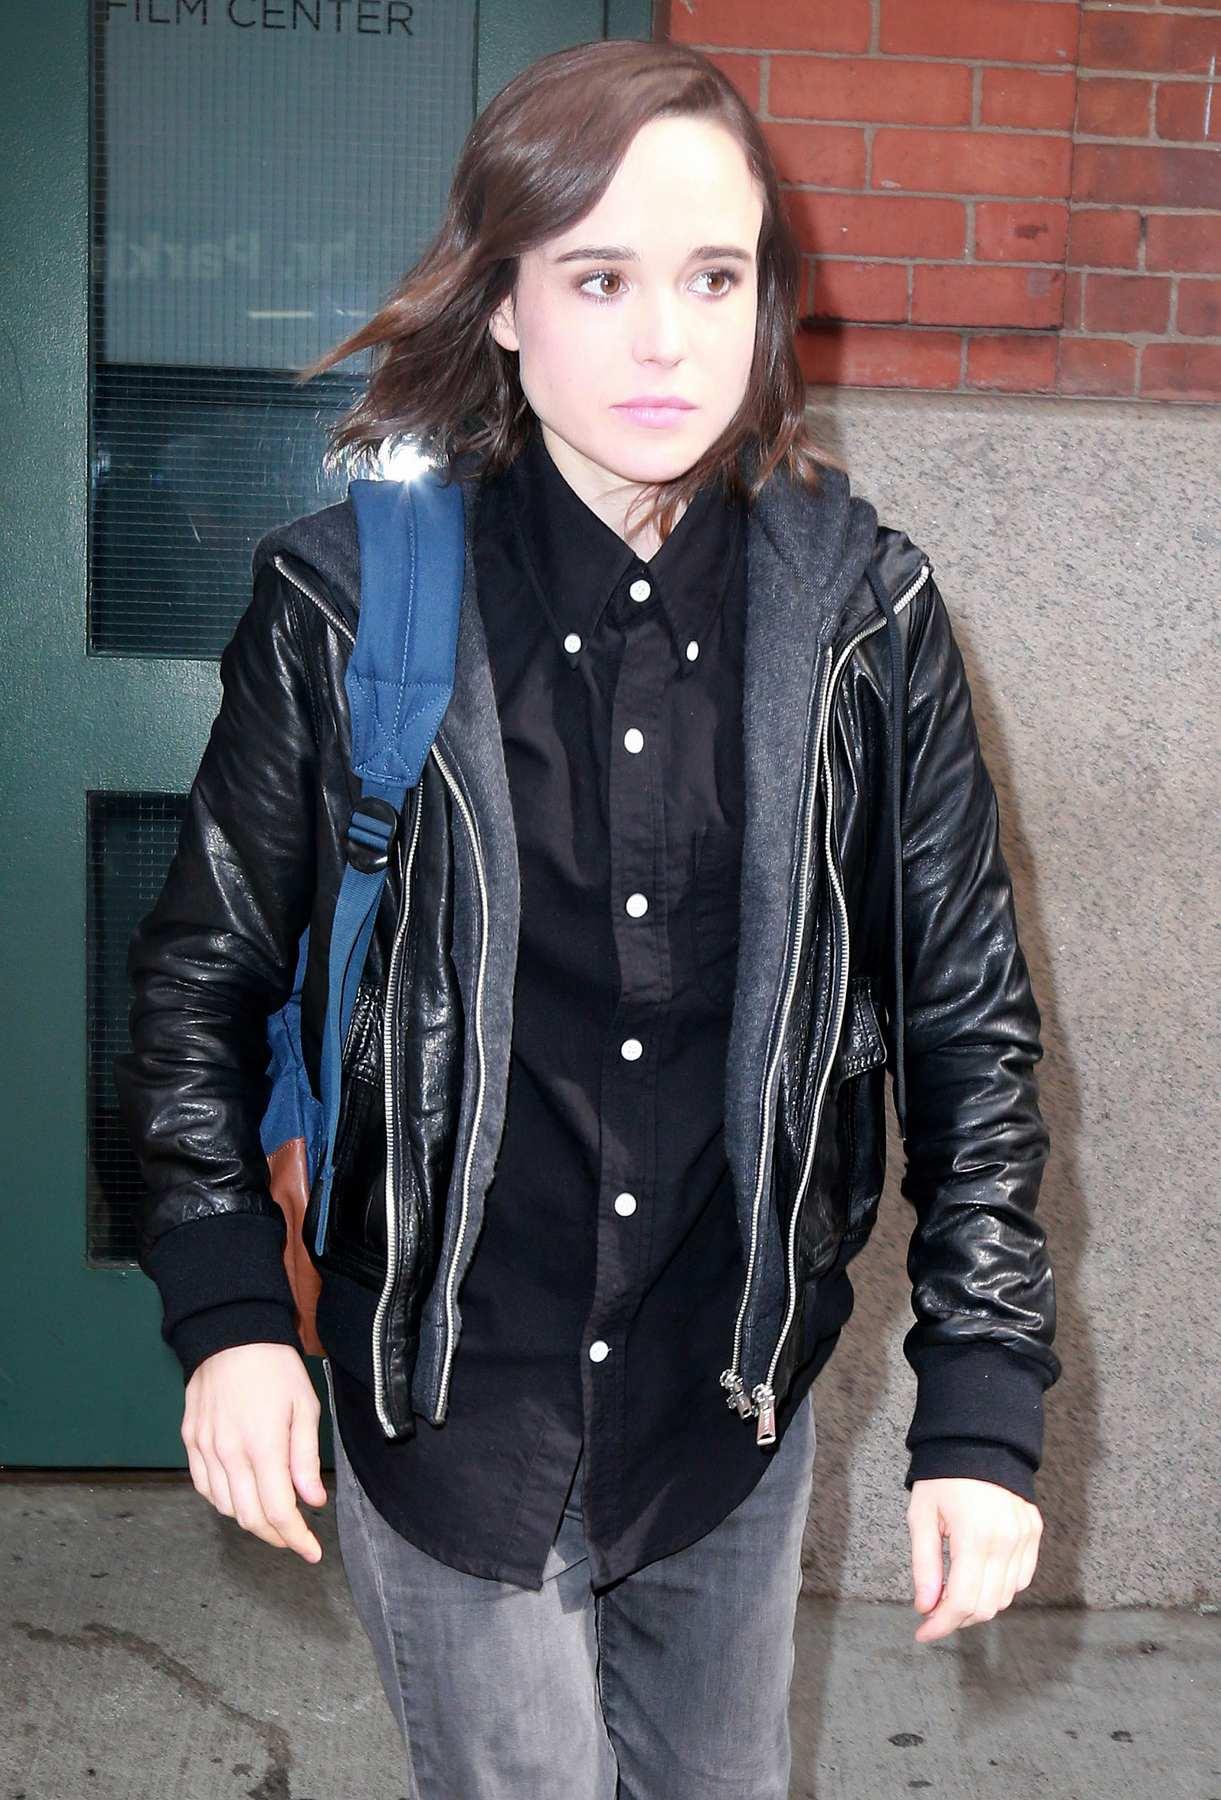 Ellen Page Leaving Tribeca Film Center-3